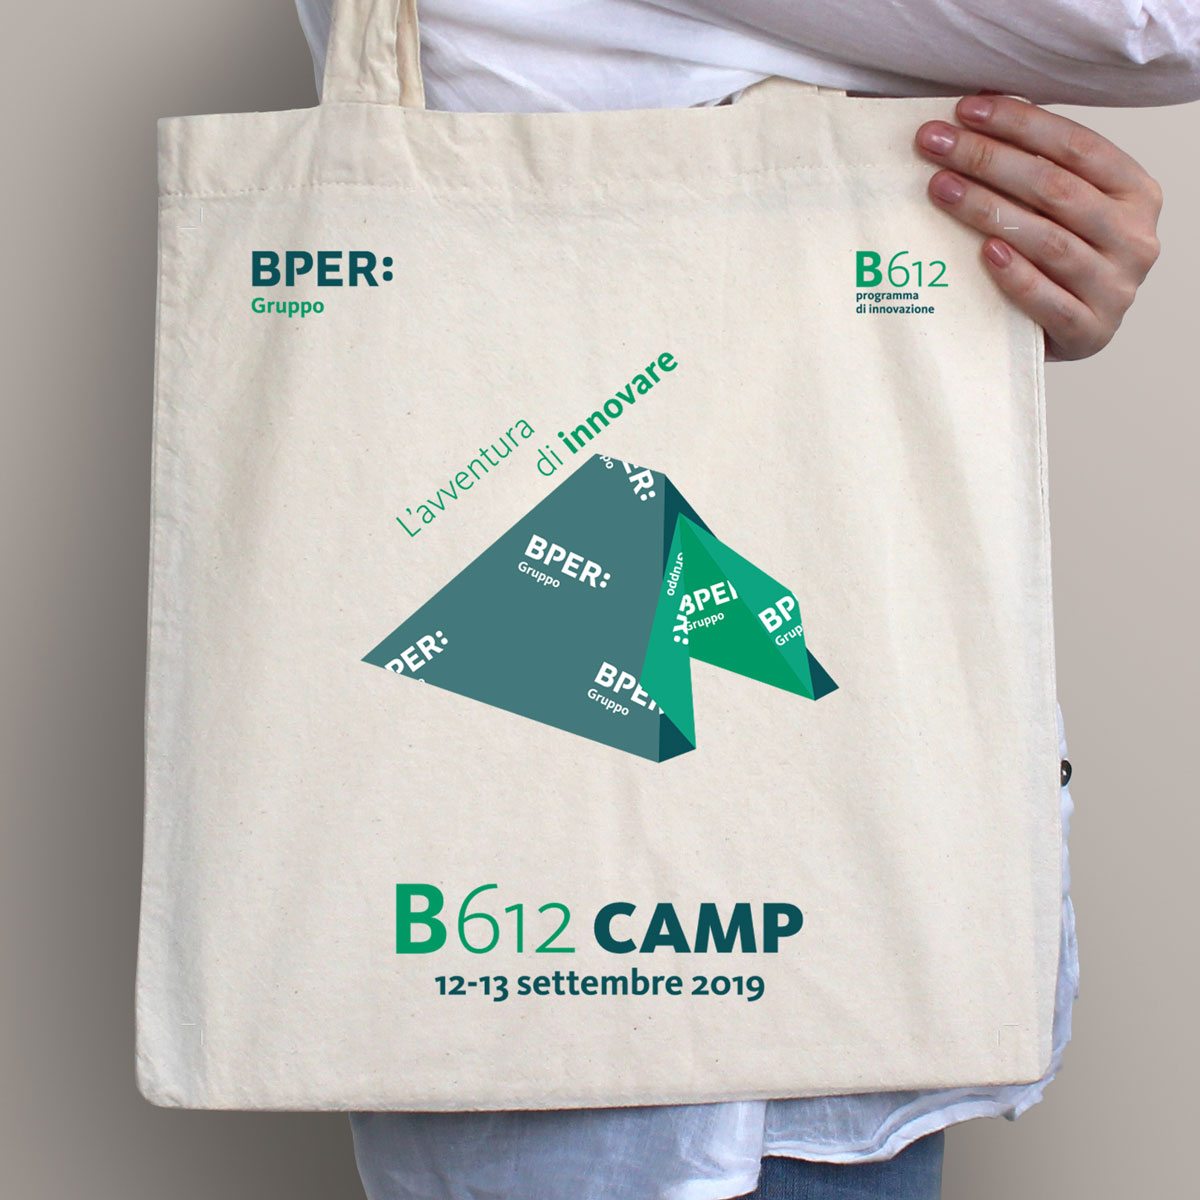 industree-gruppo-BPER-B612-engagement-17